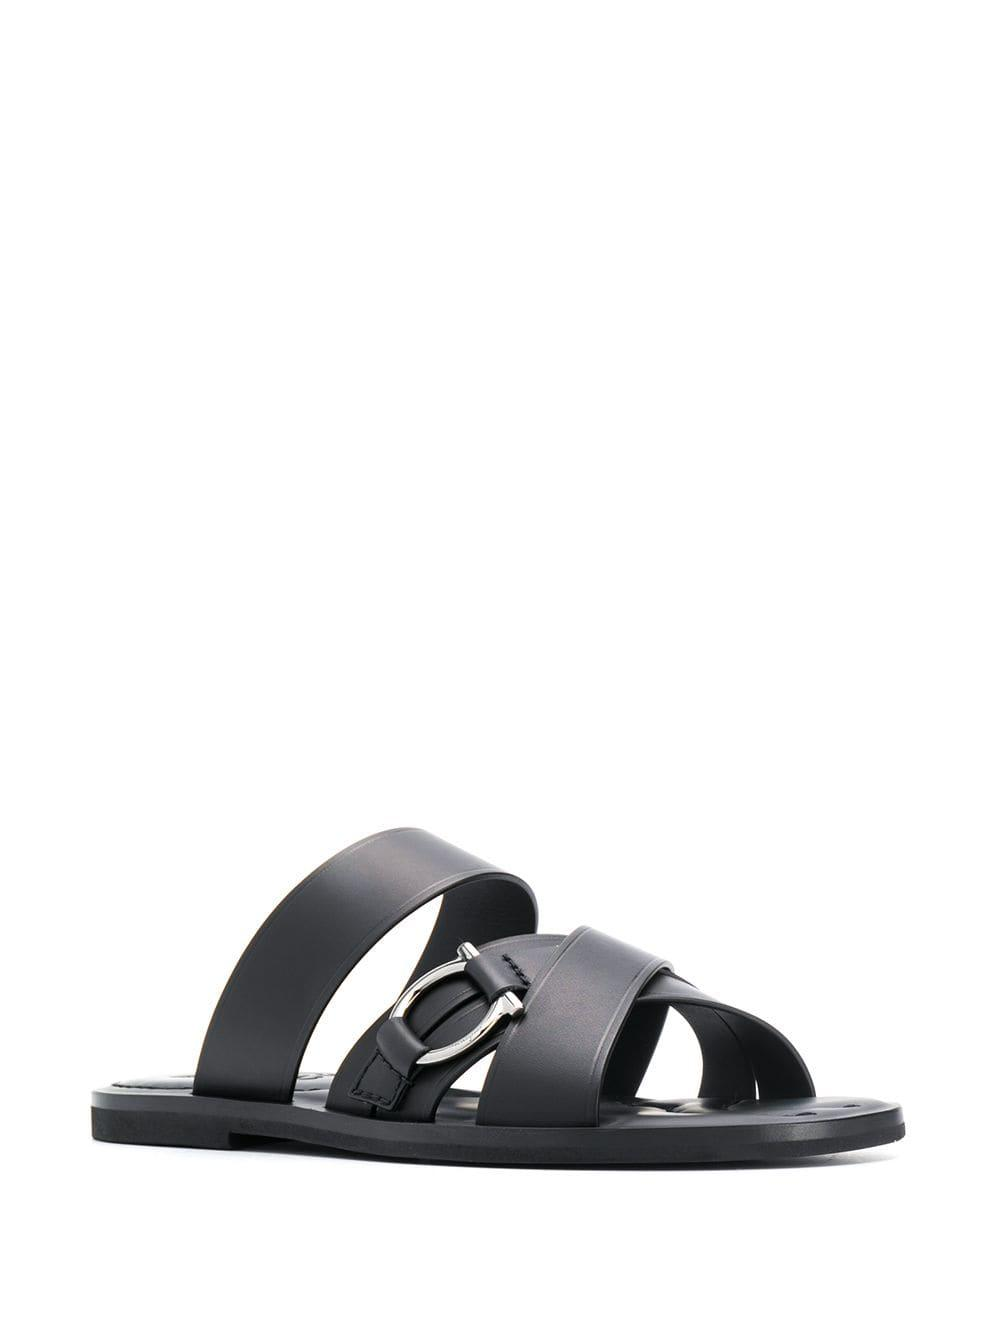 6d661bc36813 Lyst - Ferragamo Leather Sandals in Black for Men